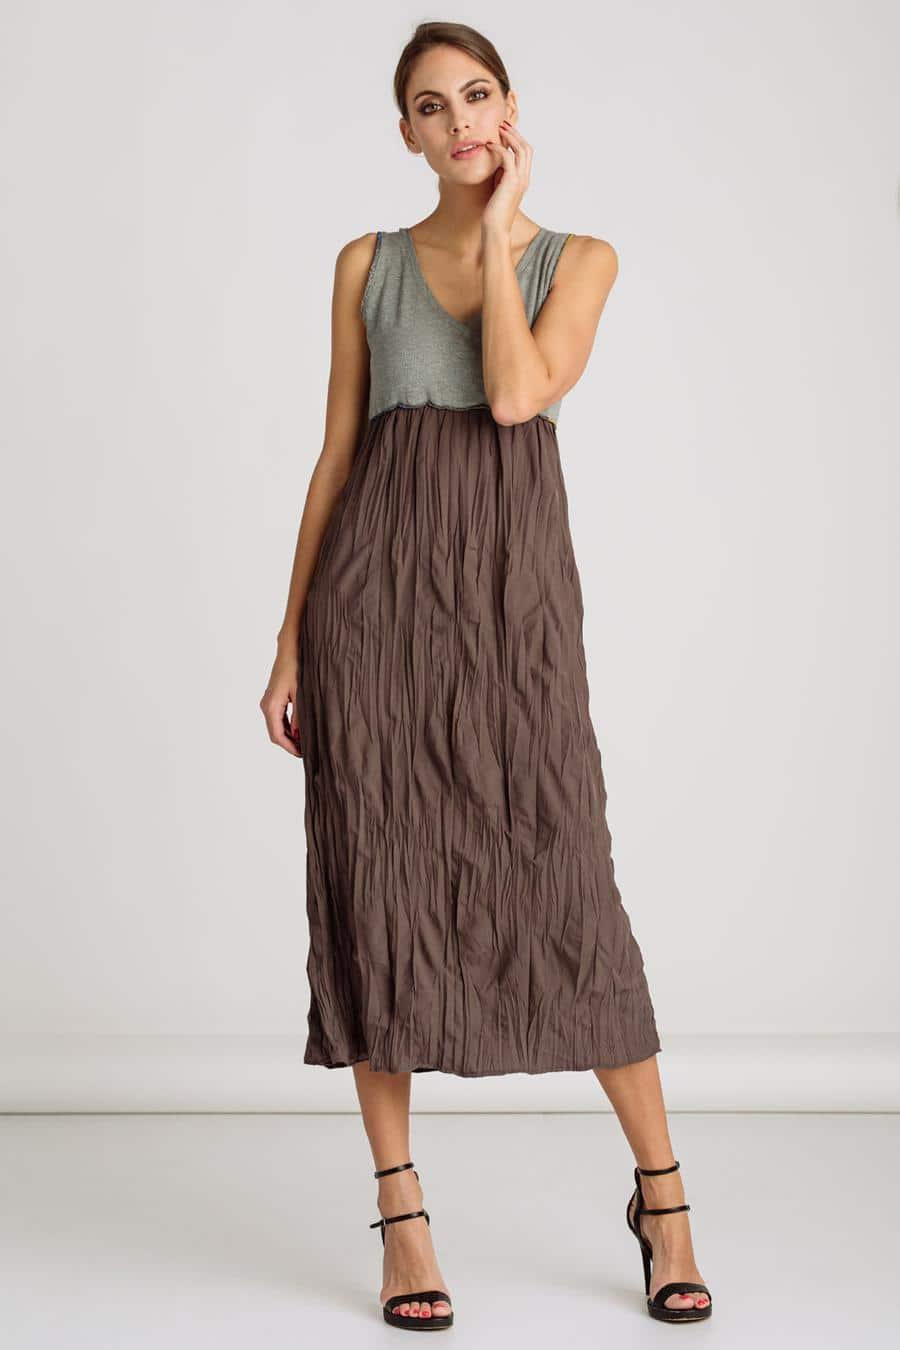 jagger zenska haljina kolekcija prolece leto 2021 ss 2021 kupi online jg 5488 05 1